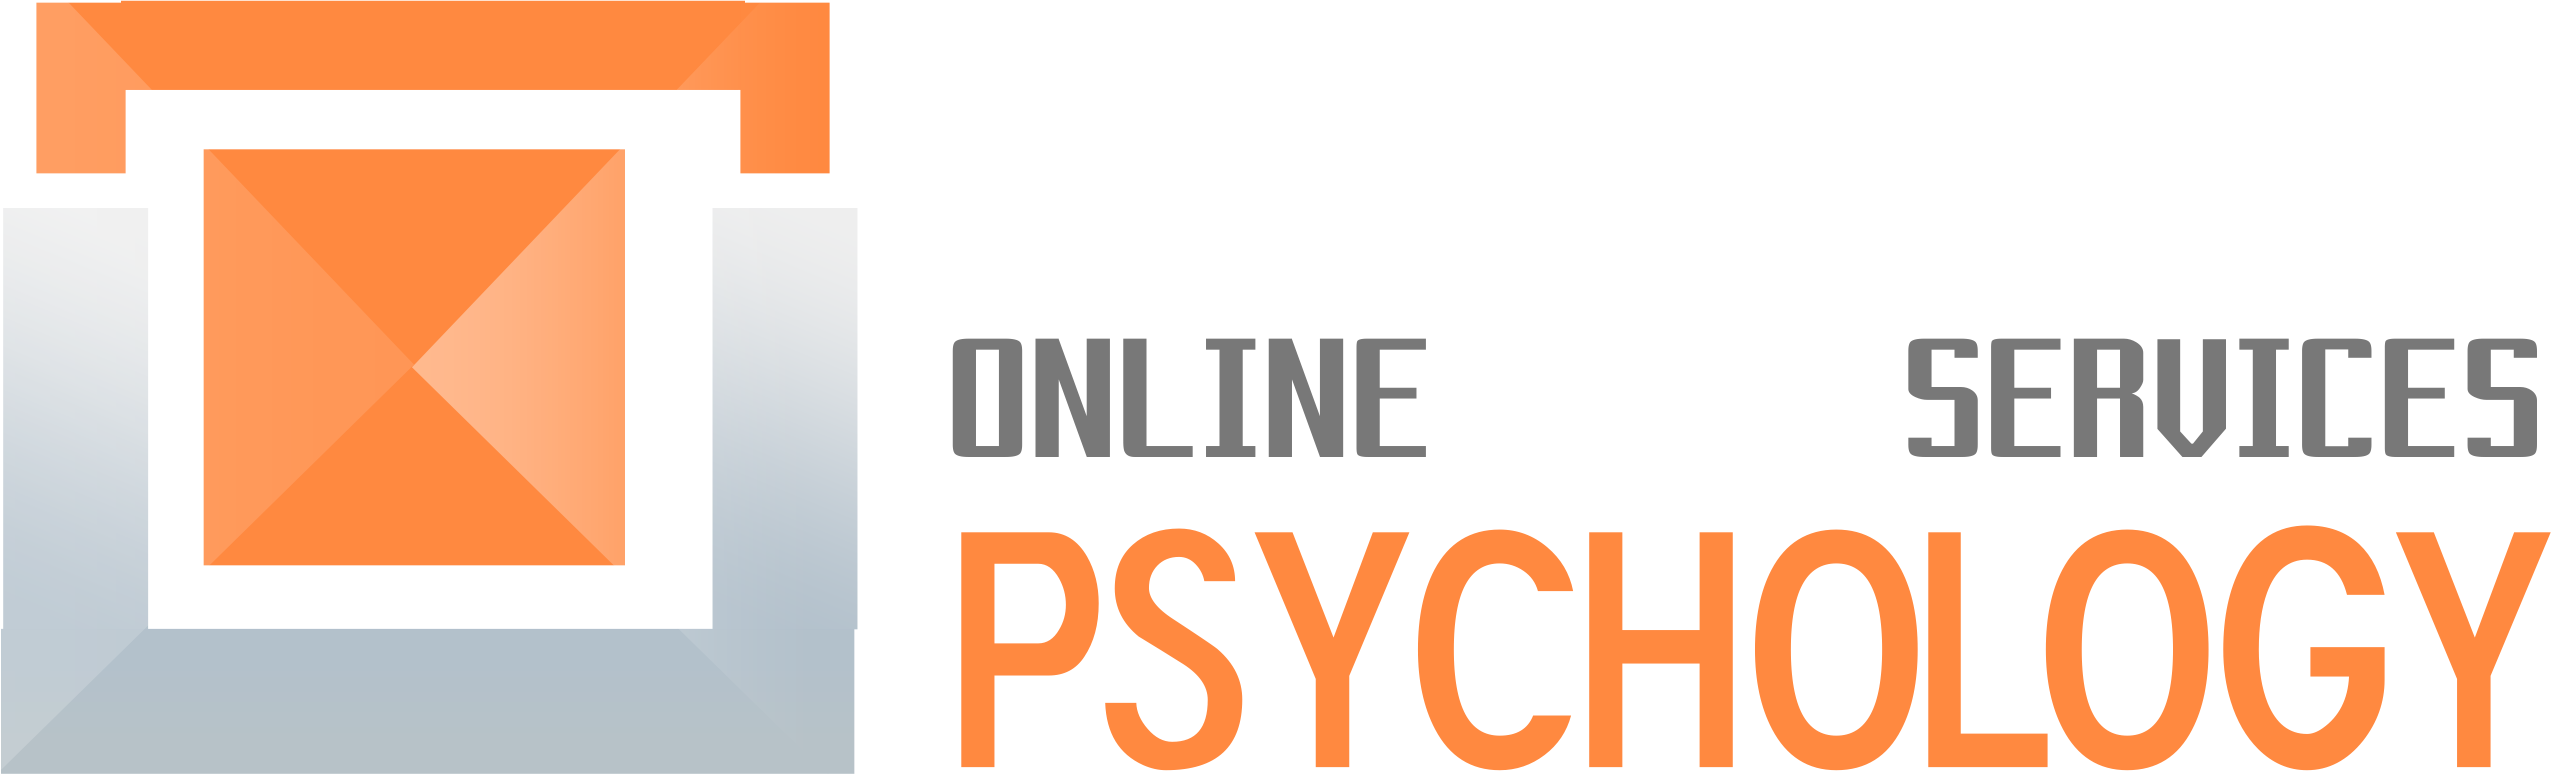 Online Psychology Services